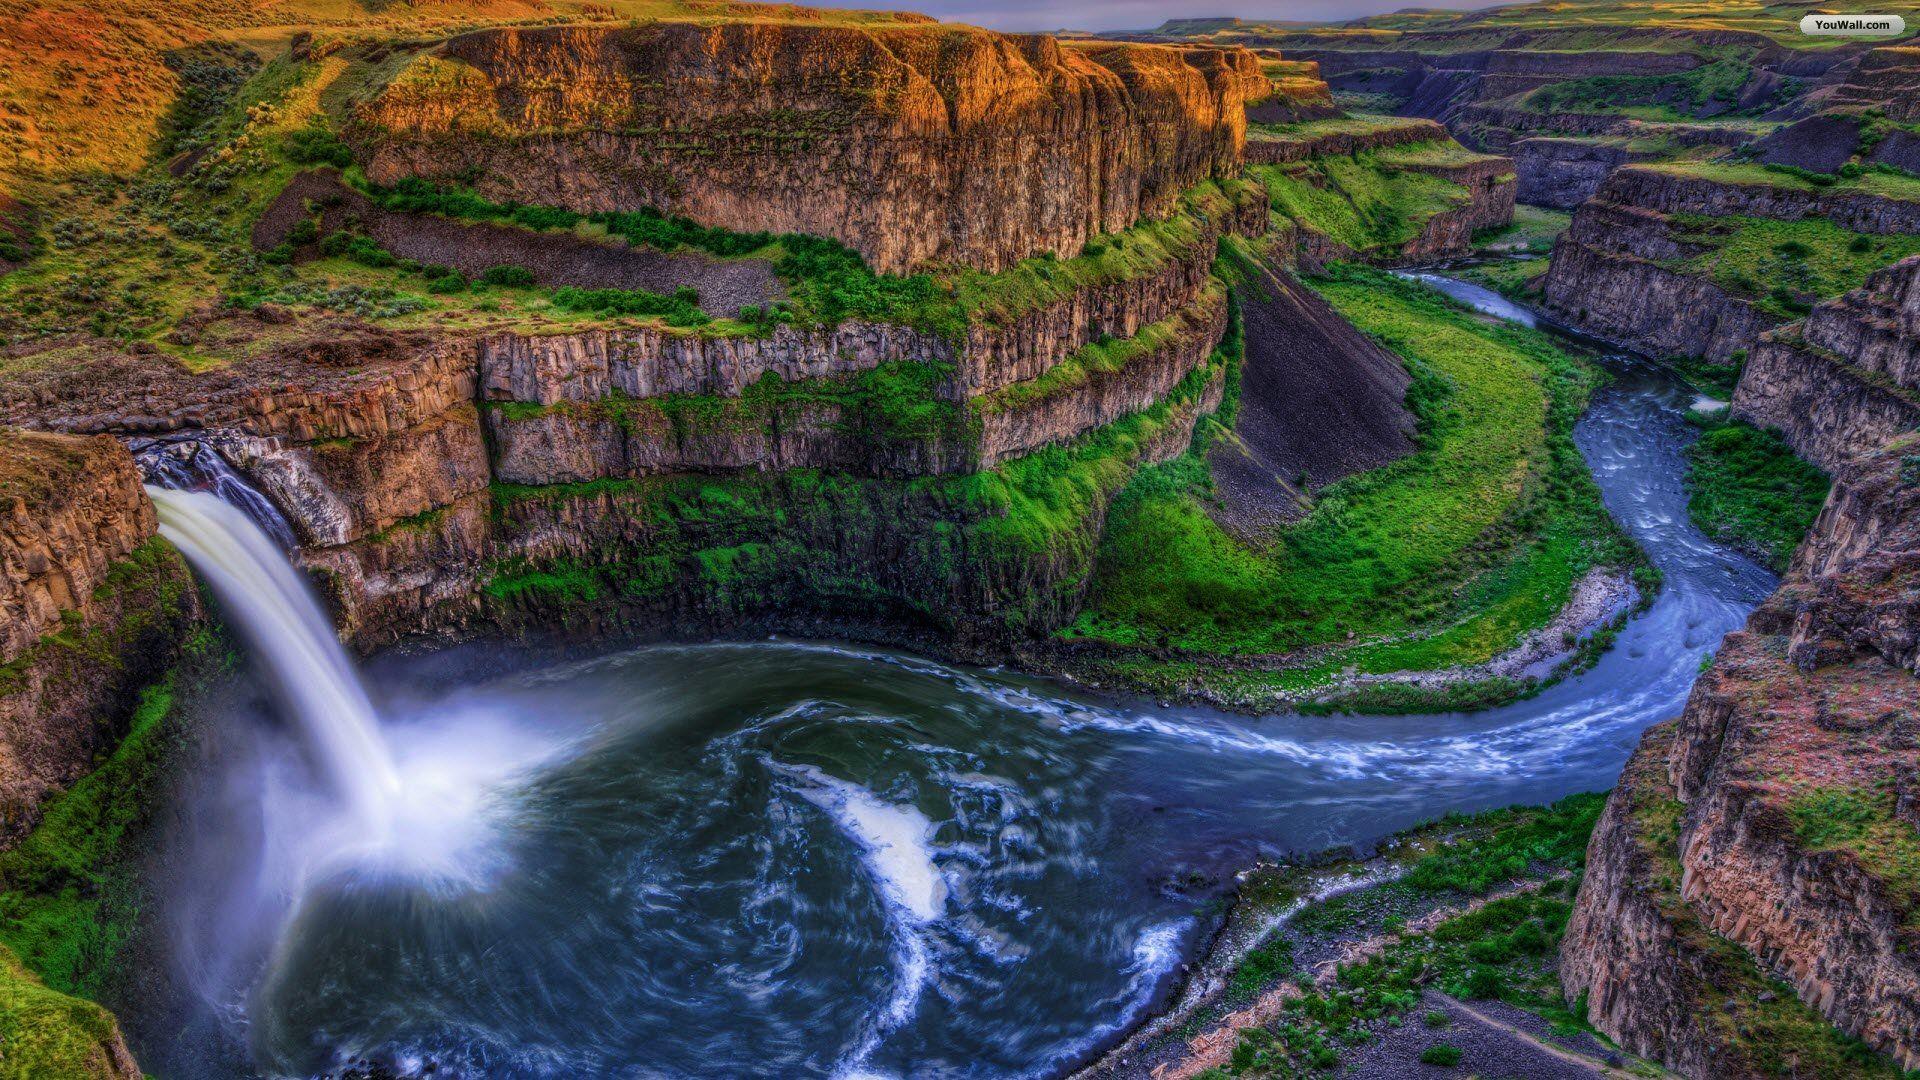 Marvelous landscape google search landscape pinterest hd waterfalls canyon grand teton national park wyoming u voltagebd Gallery